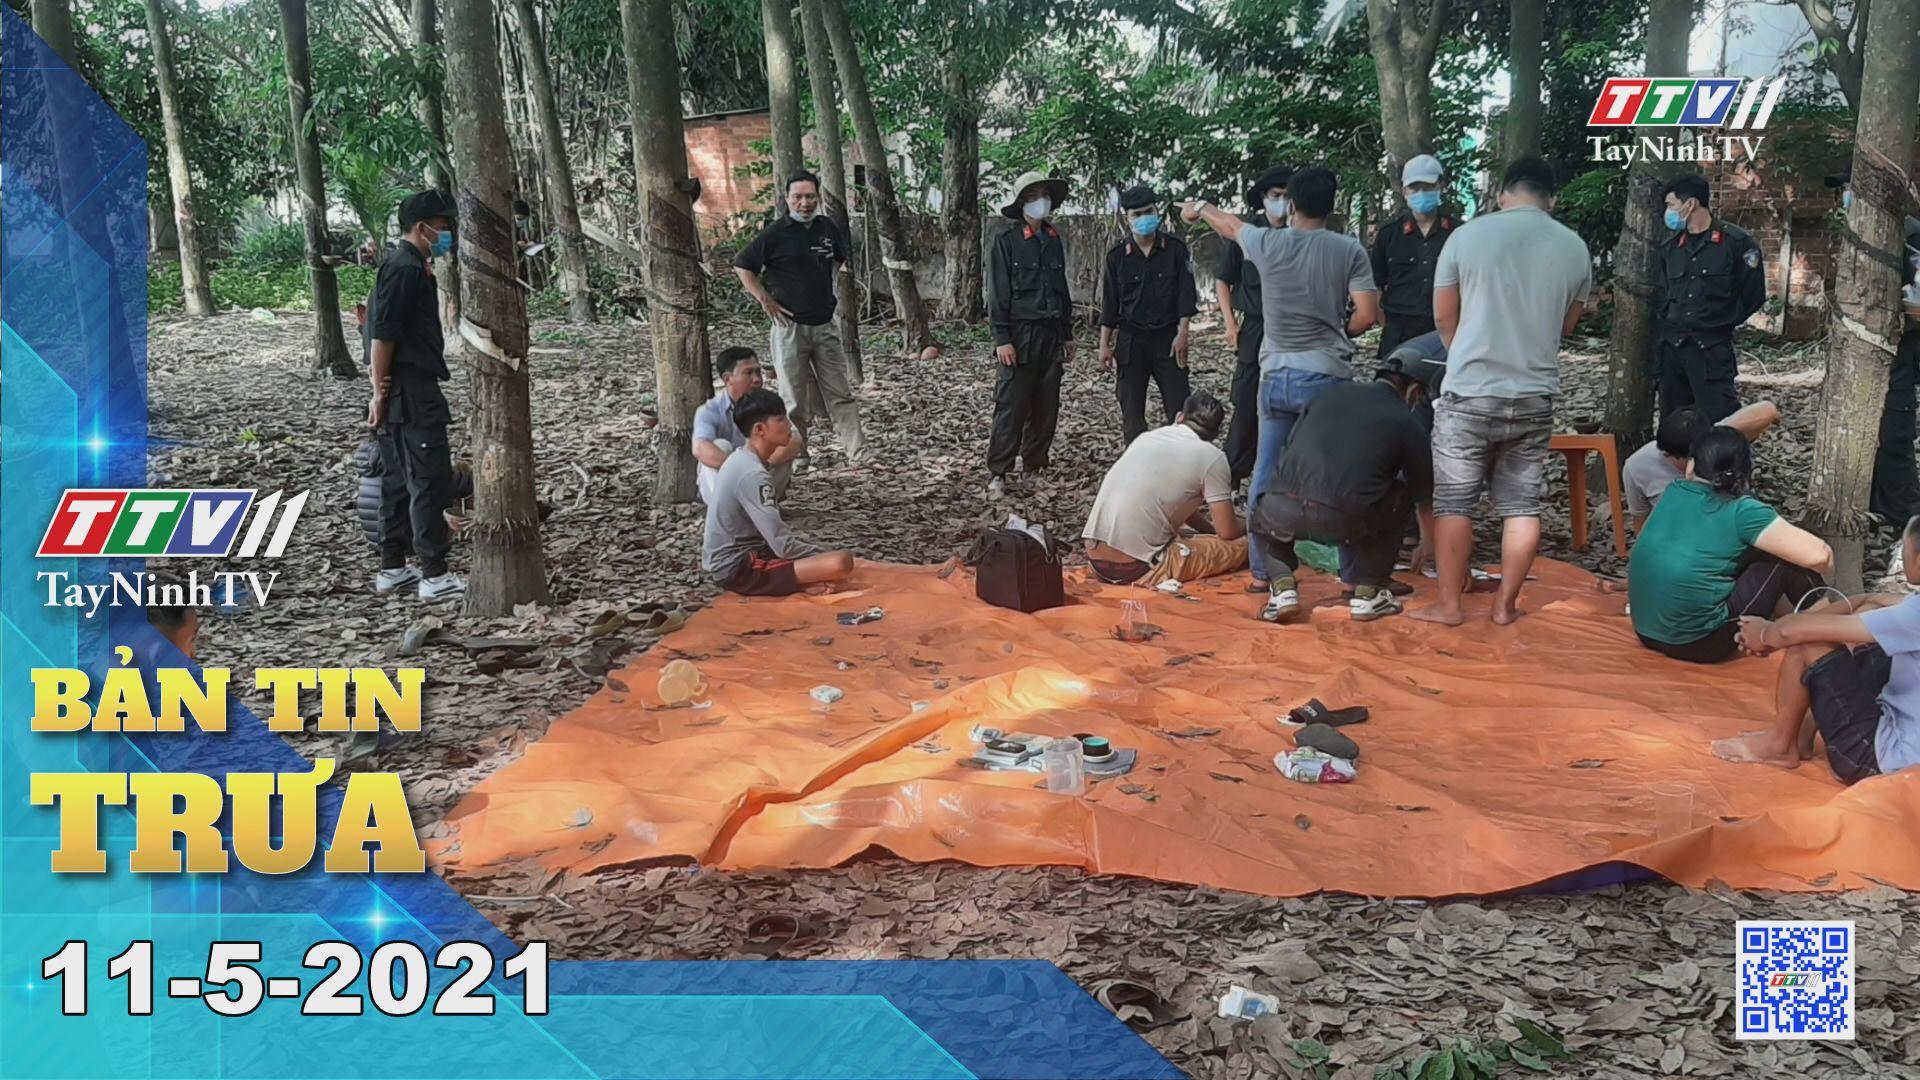 Bản tin trưa 11-5-2021 | Tin tức hôm nay | TayNinhTV